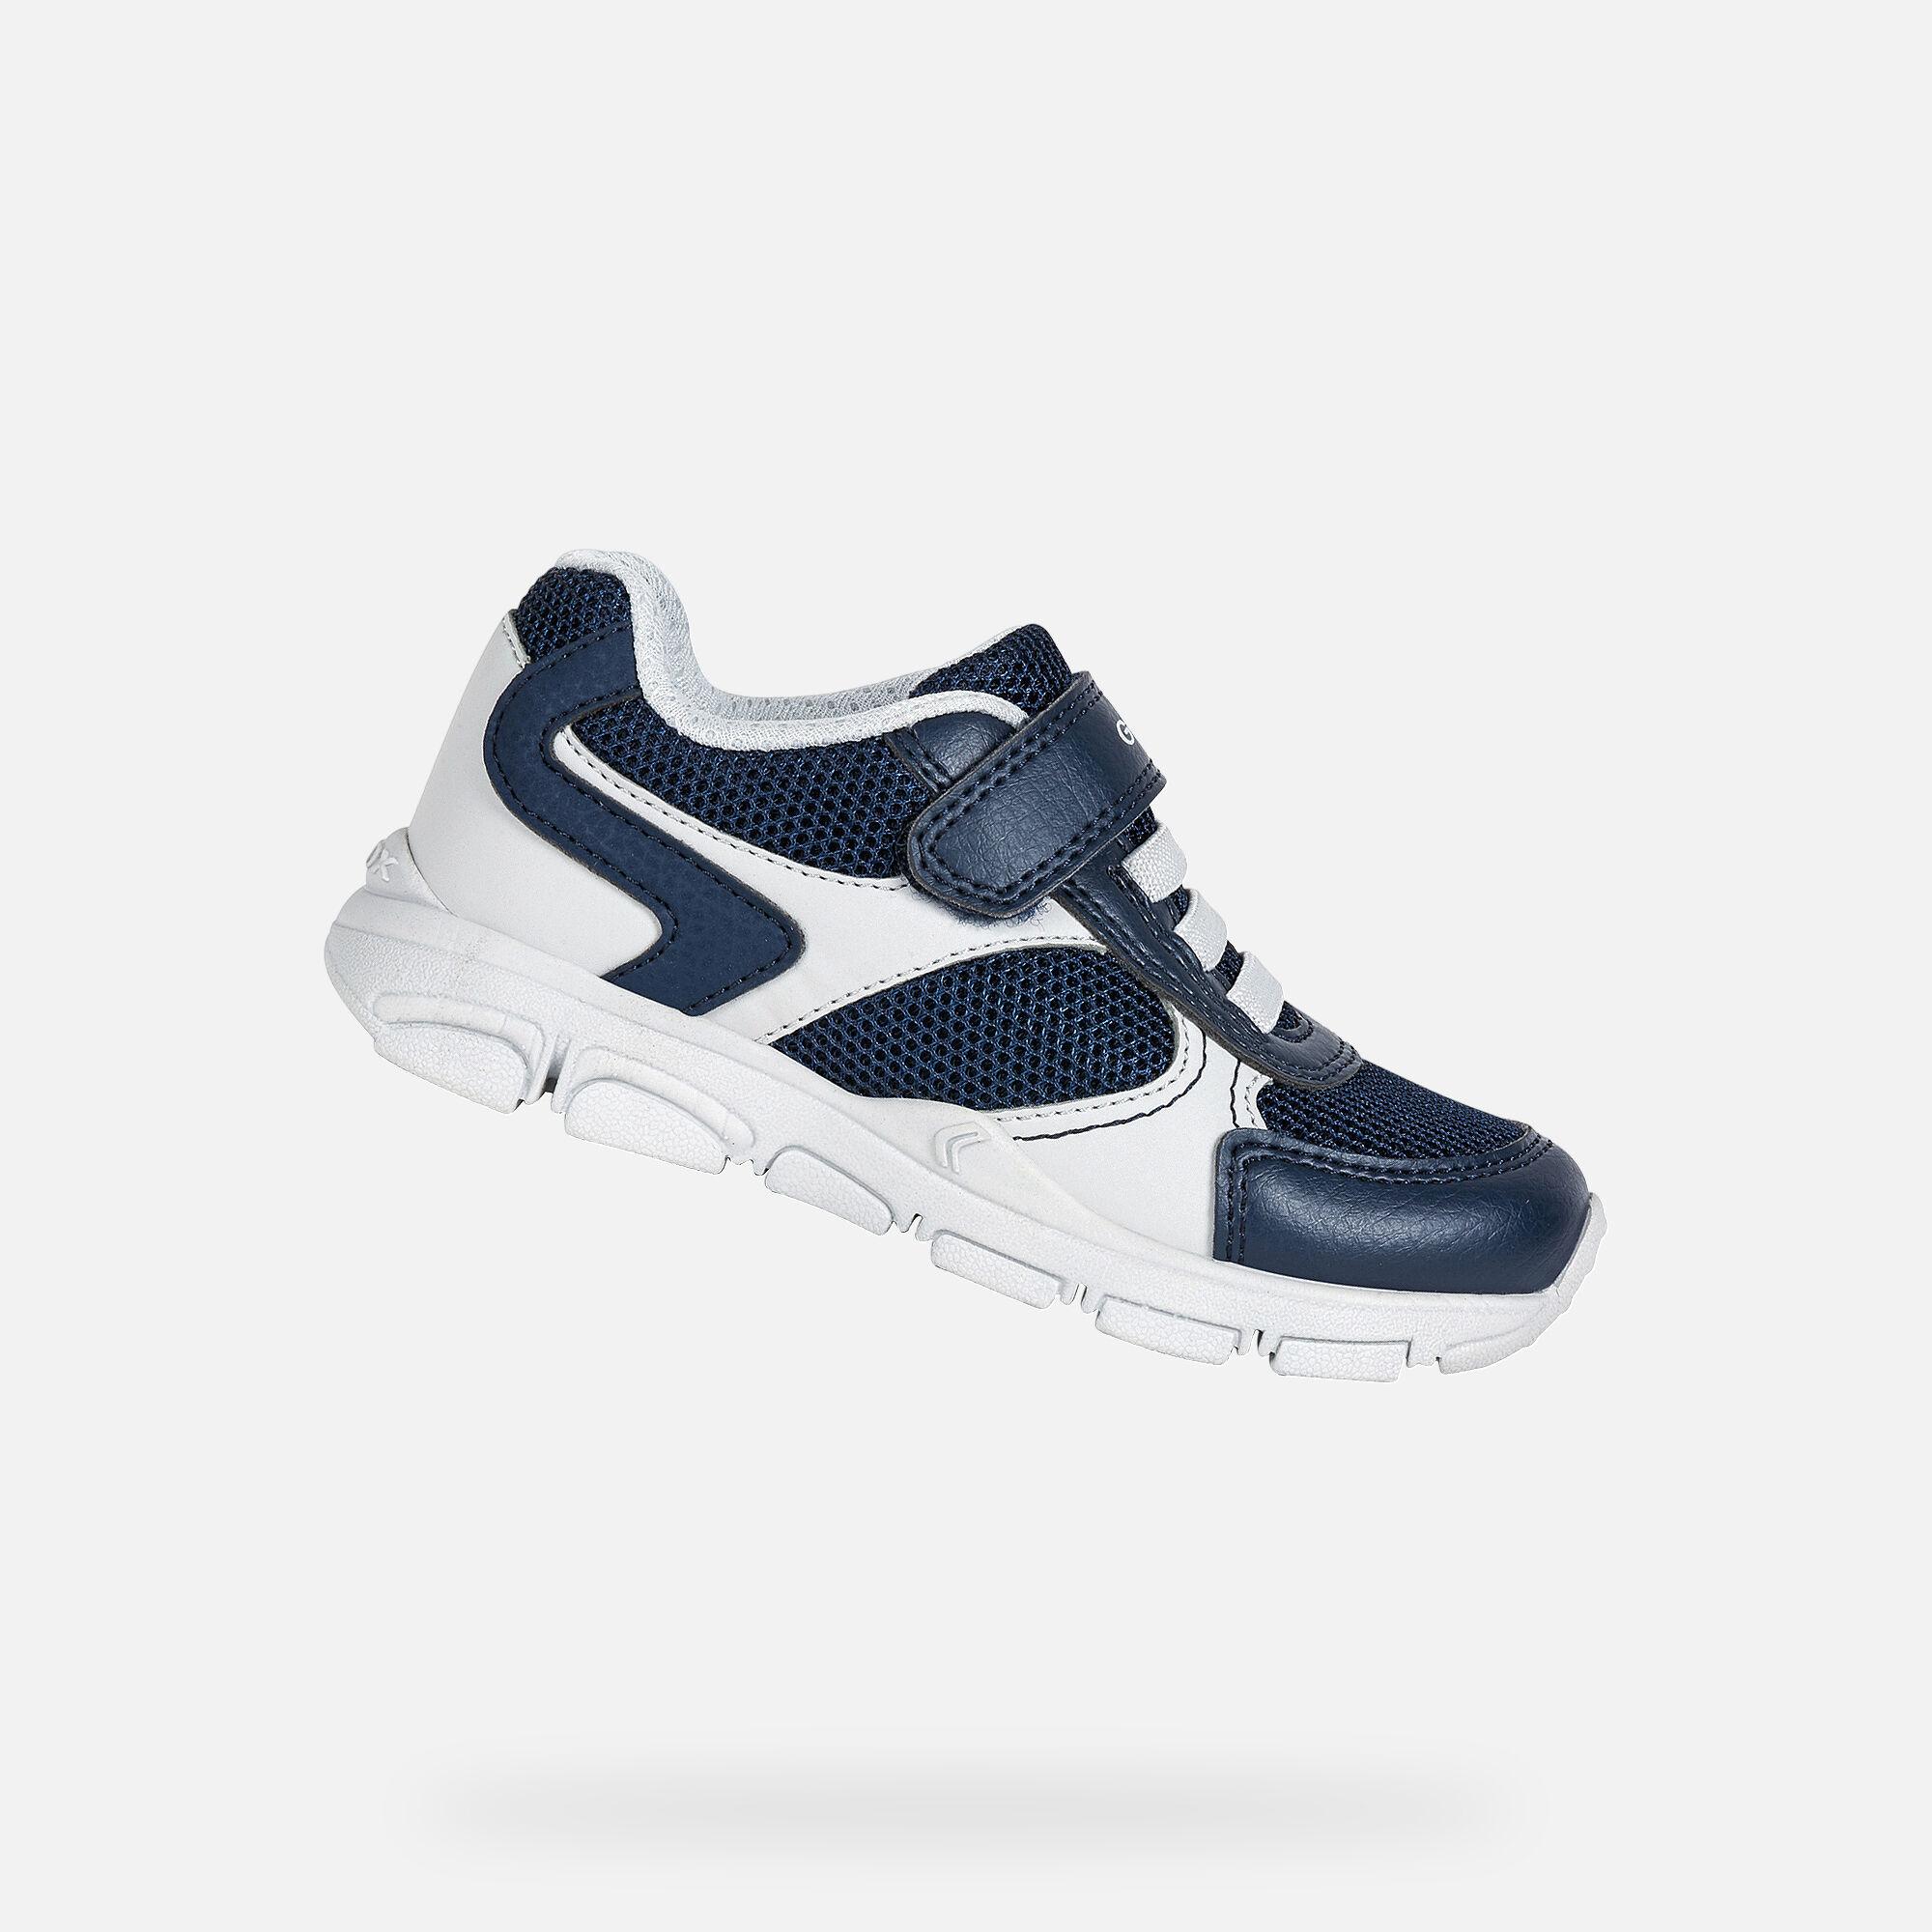 Geox TORQUE Bambino: Sneakers Blu navy | Geox ® SS 20